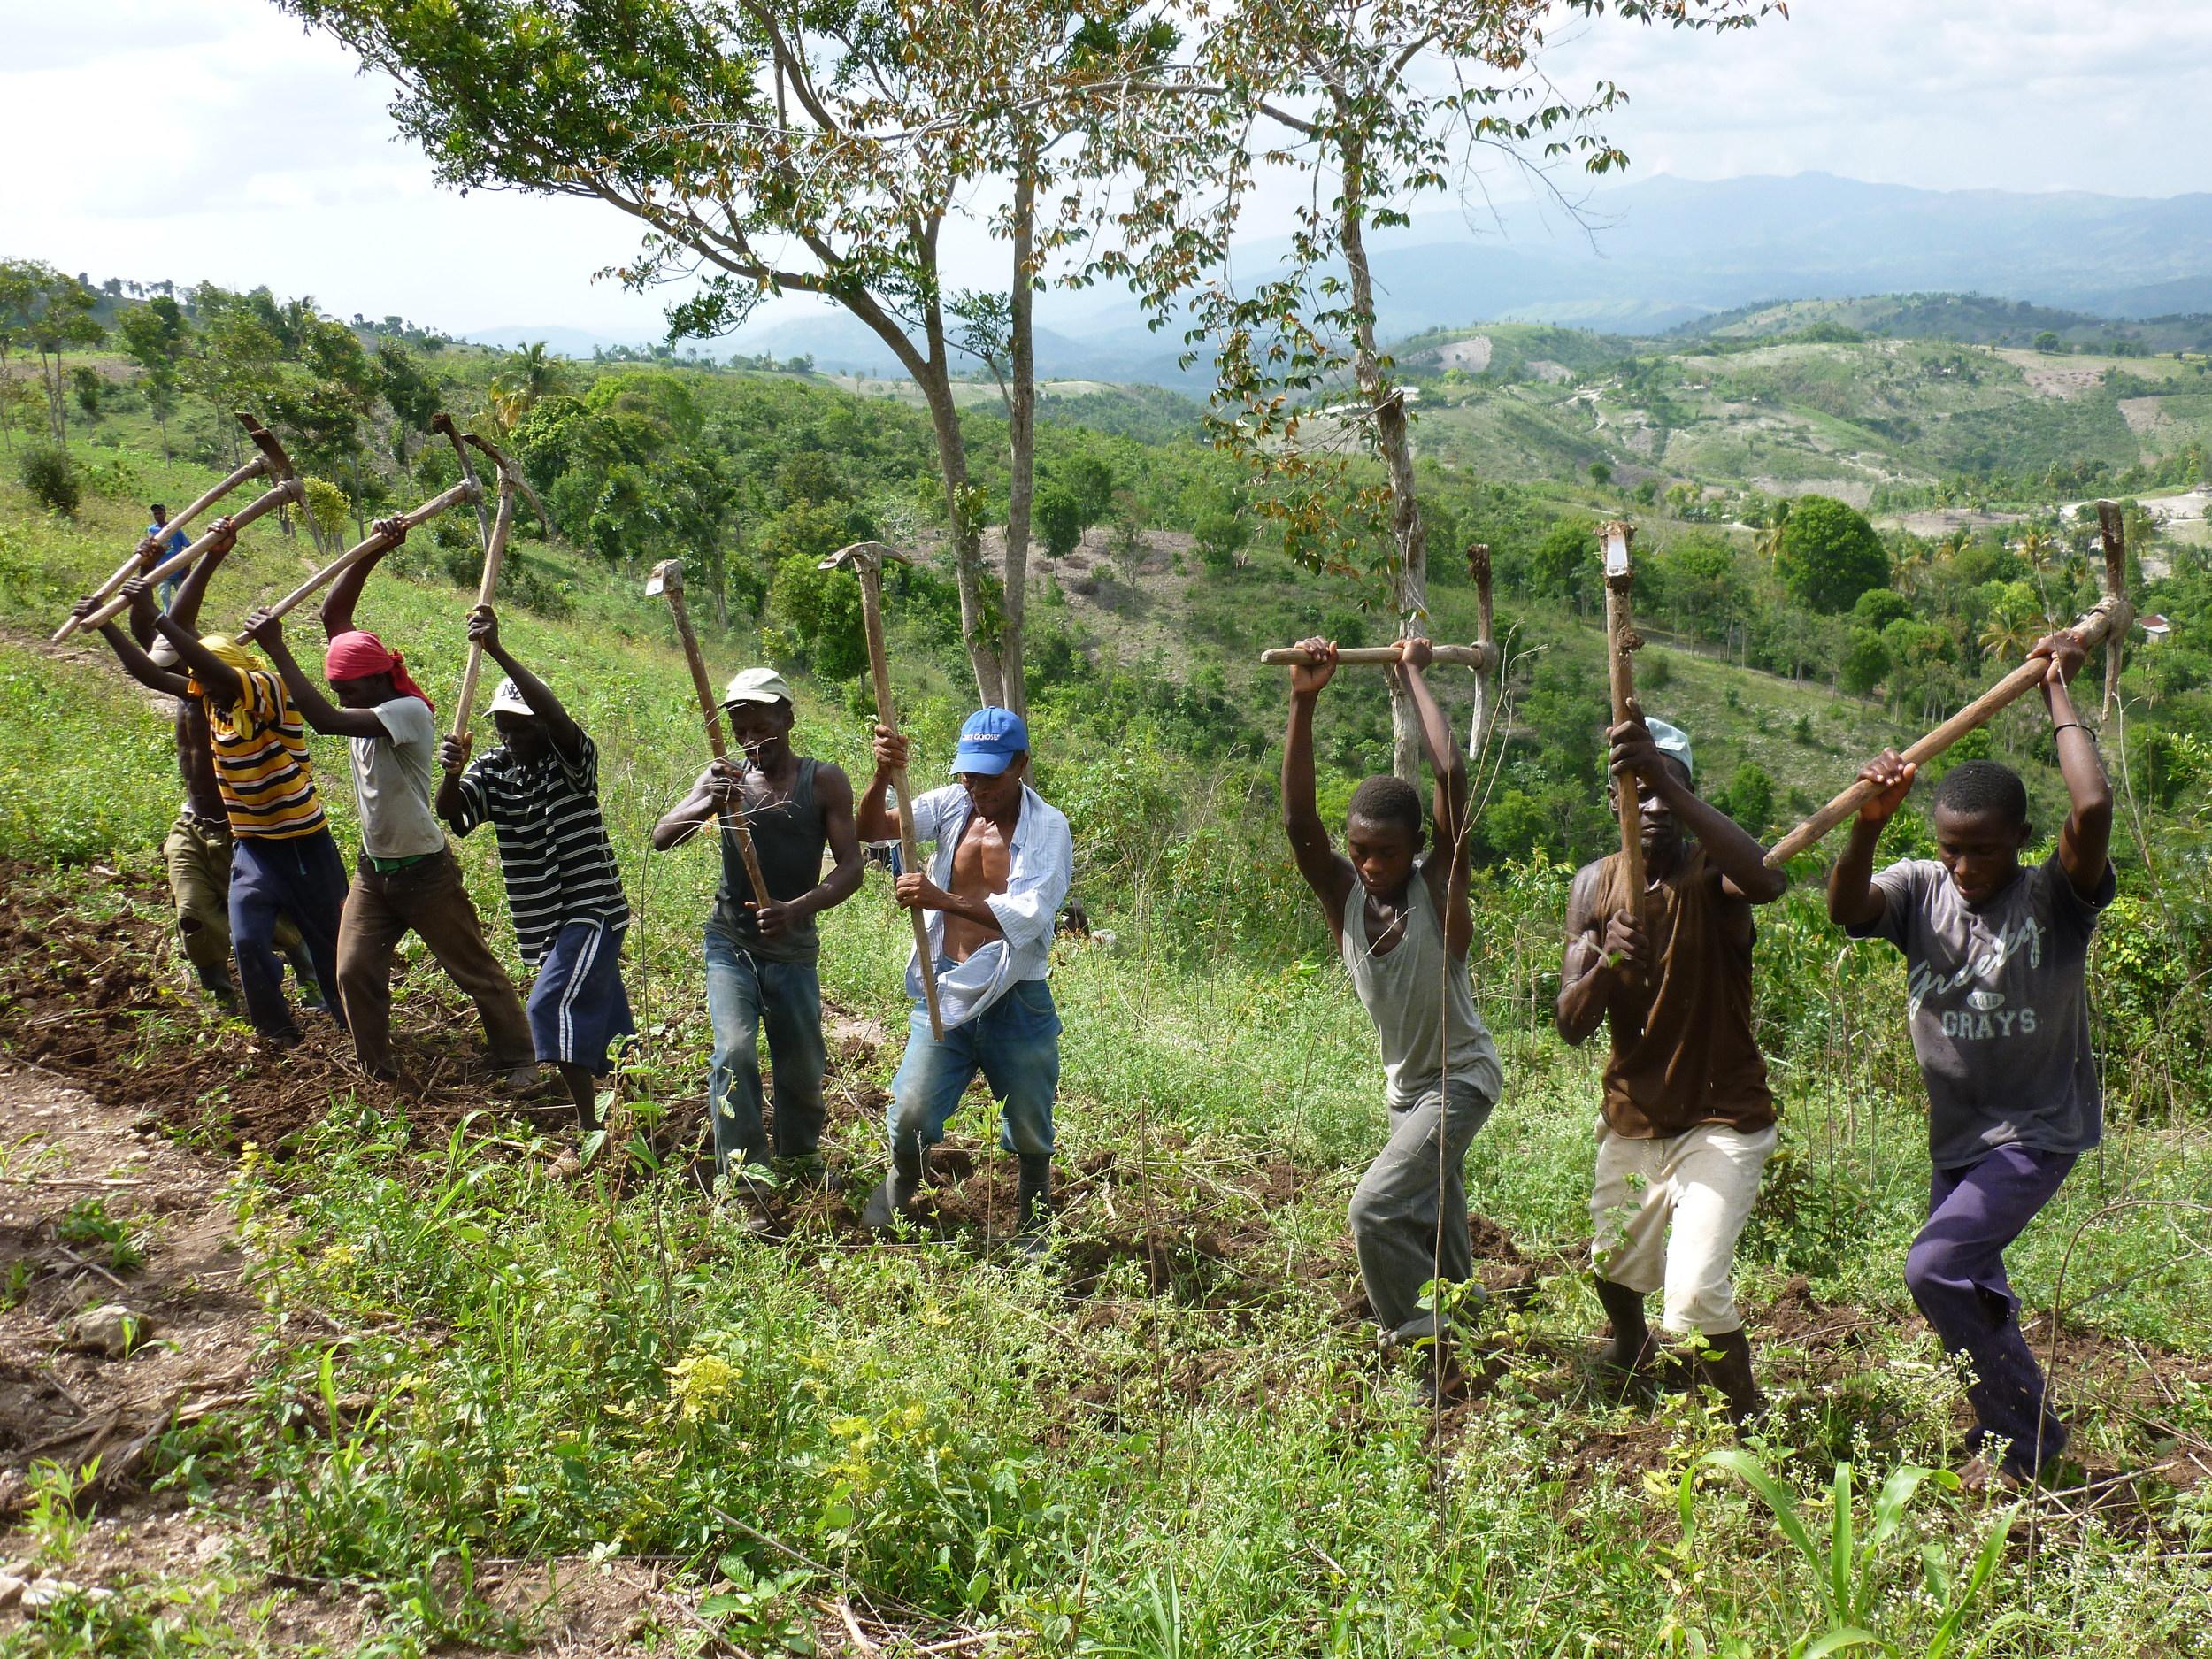 A Kombit in a Community Work event. Haiti, 2014.